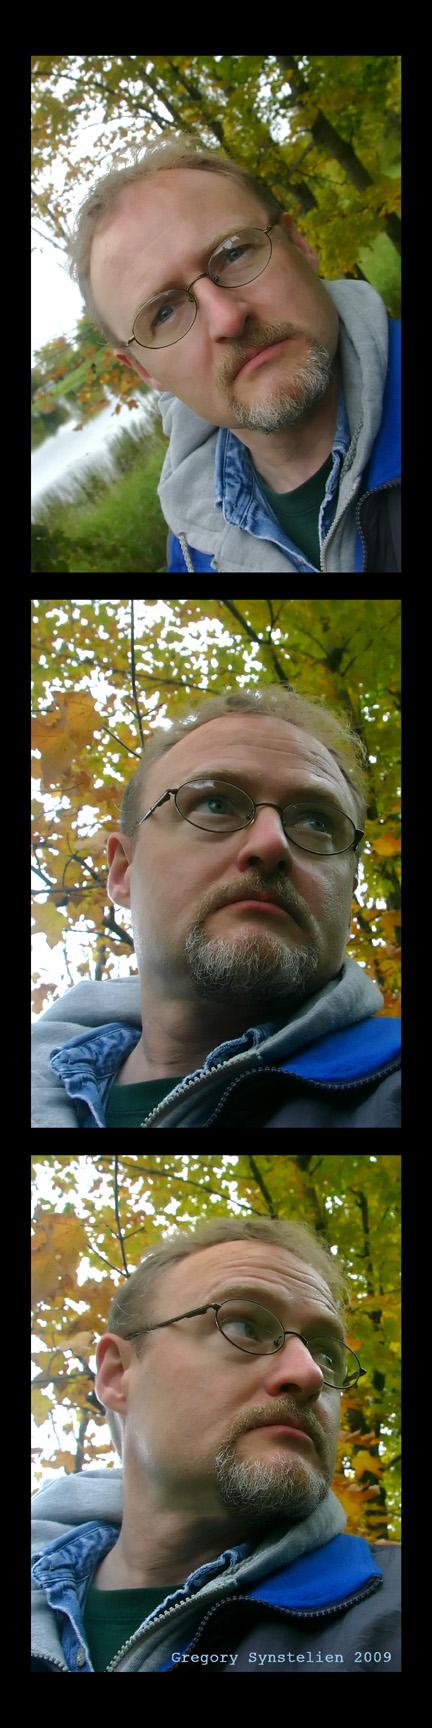 UffdaGreg's Profile Picture